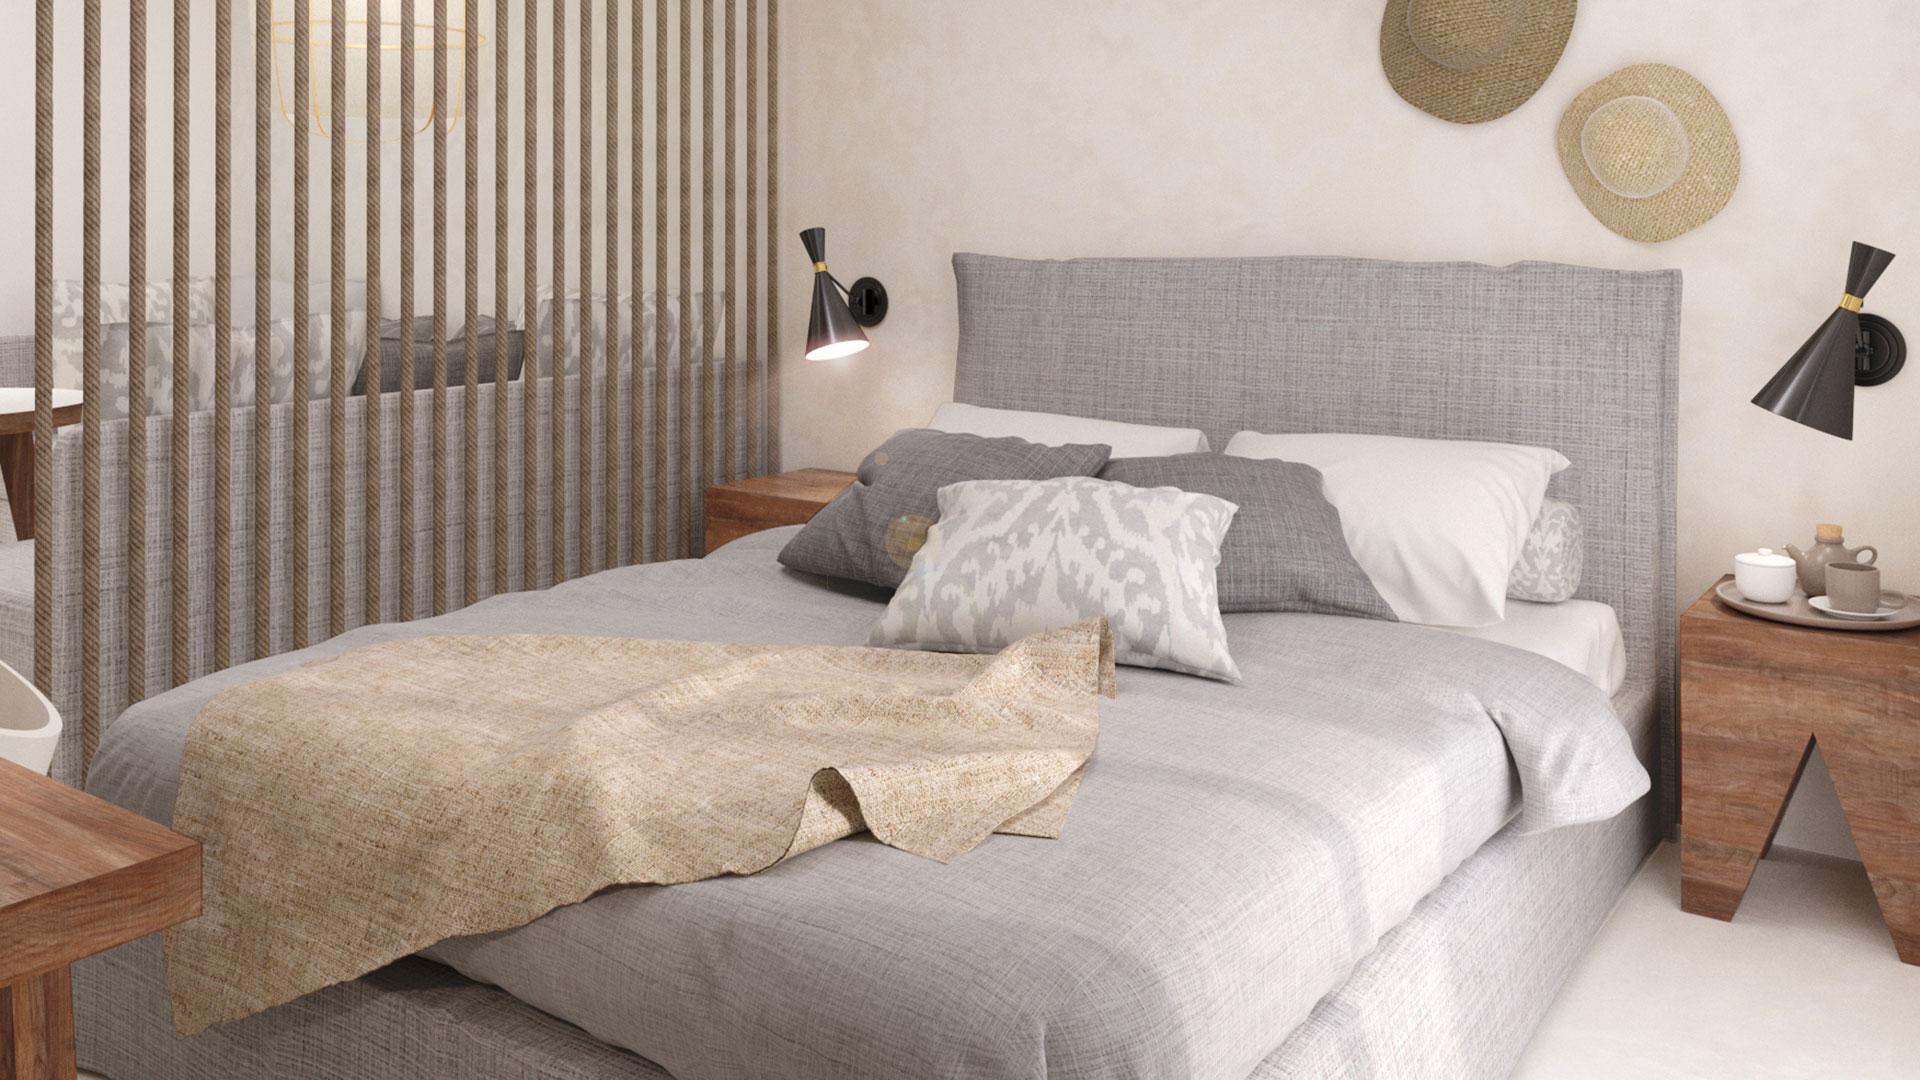 Hotel sicily tableau ciani arredamenti for Ciani arredamenti